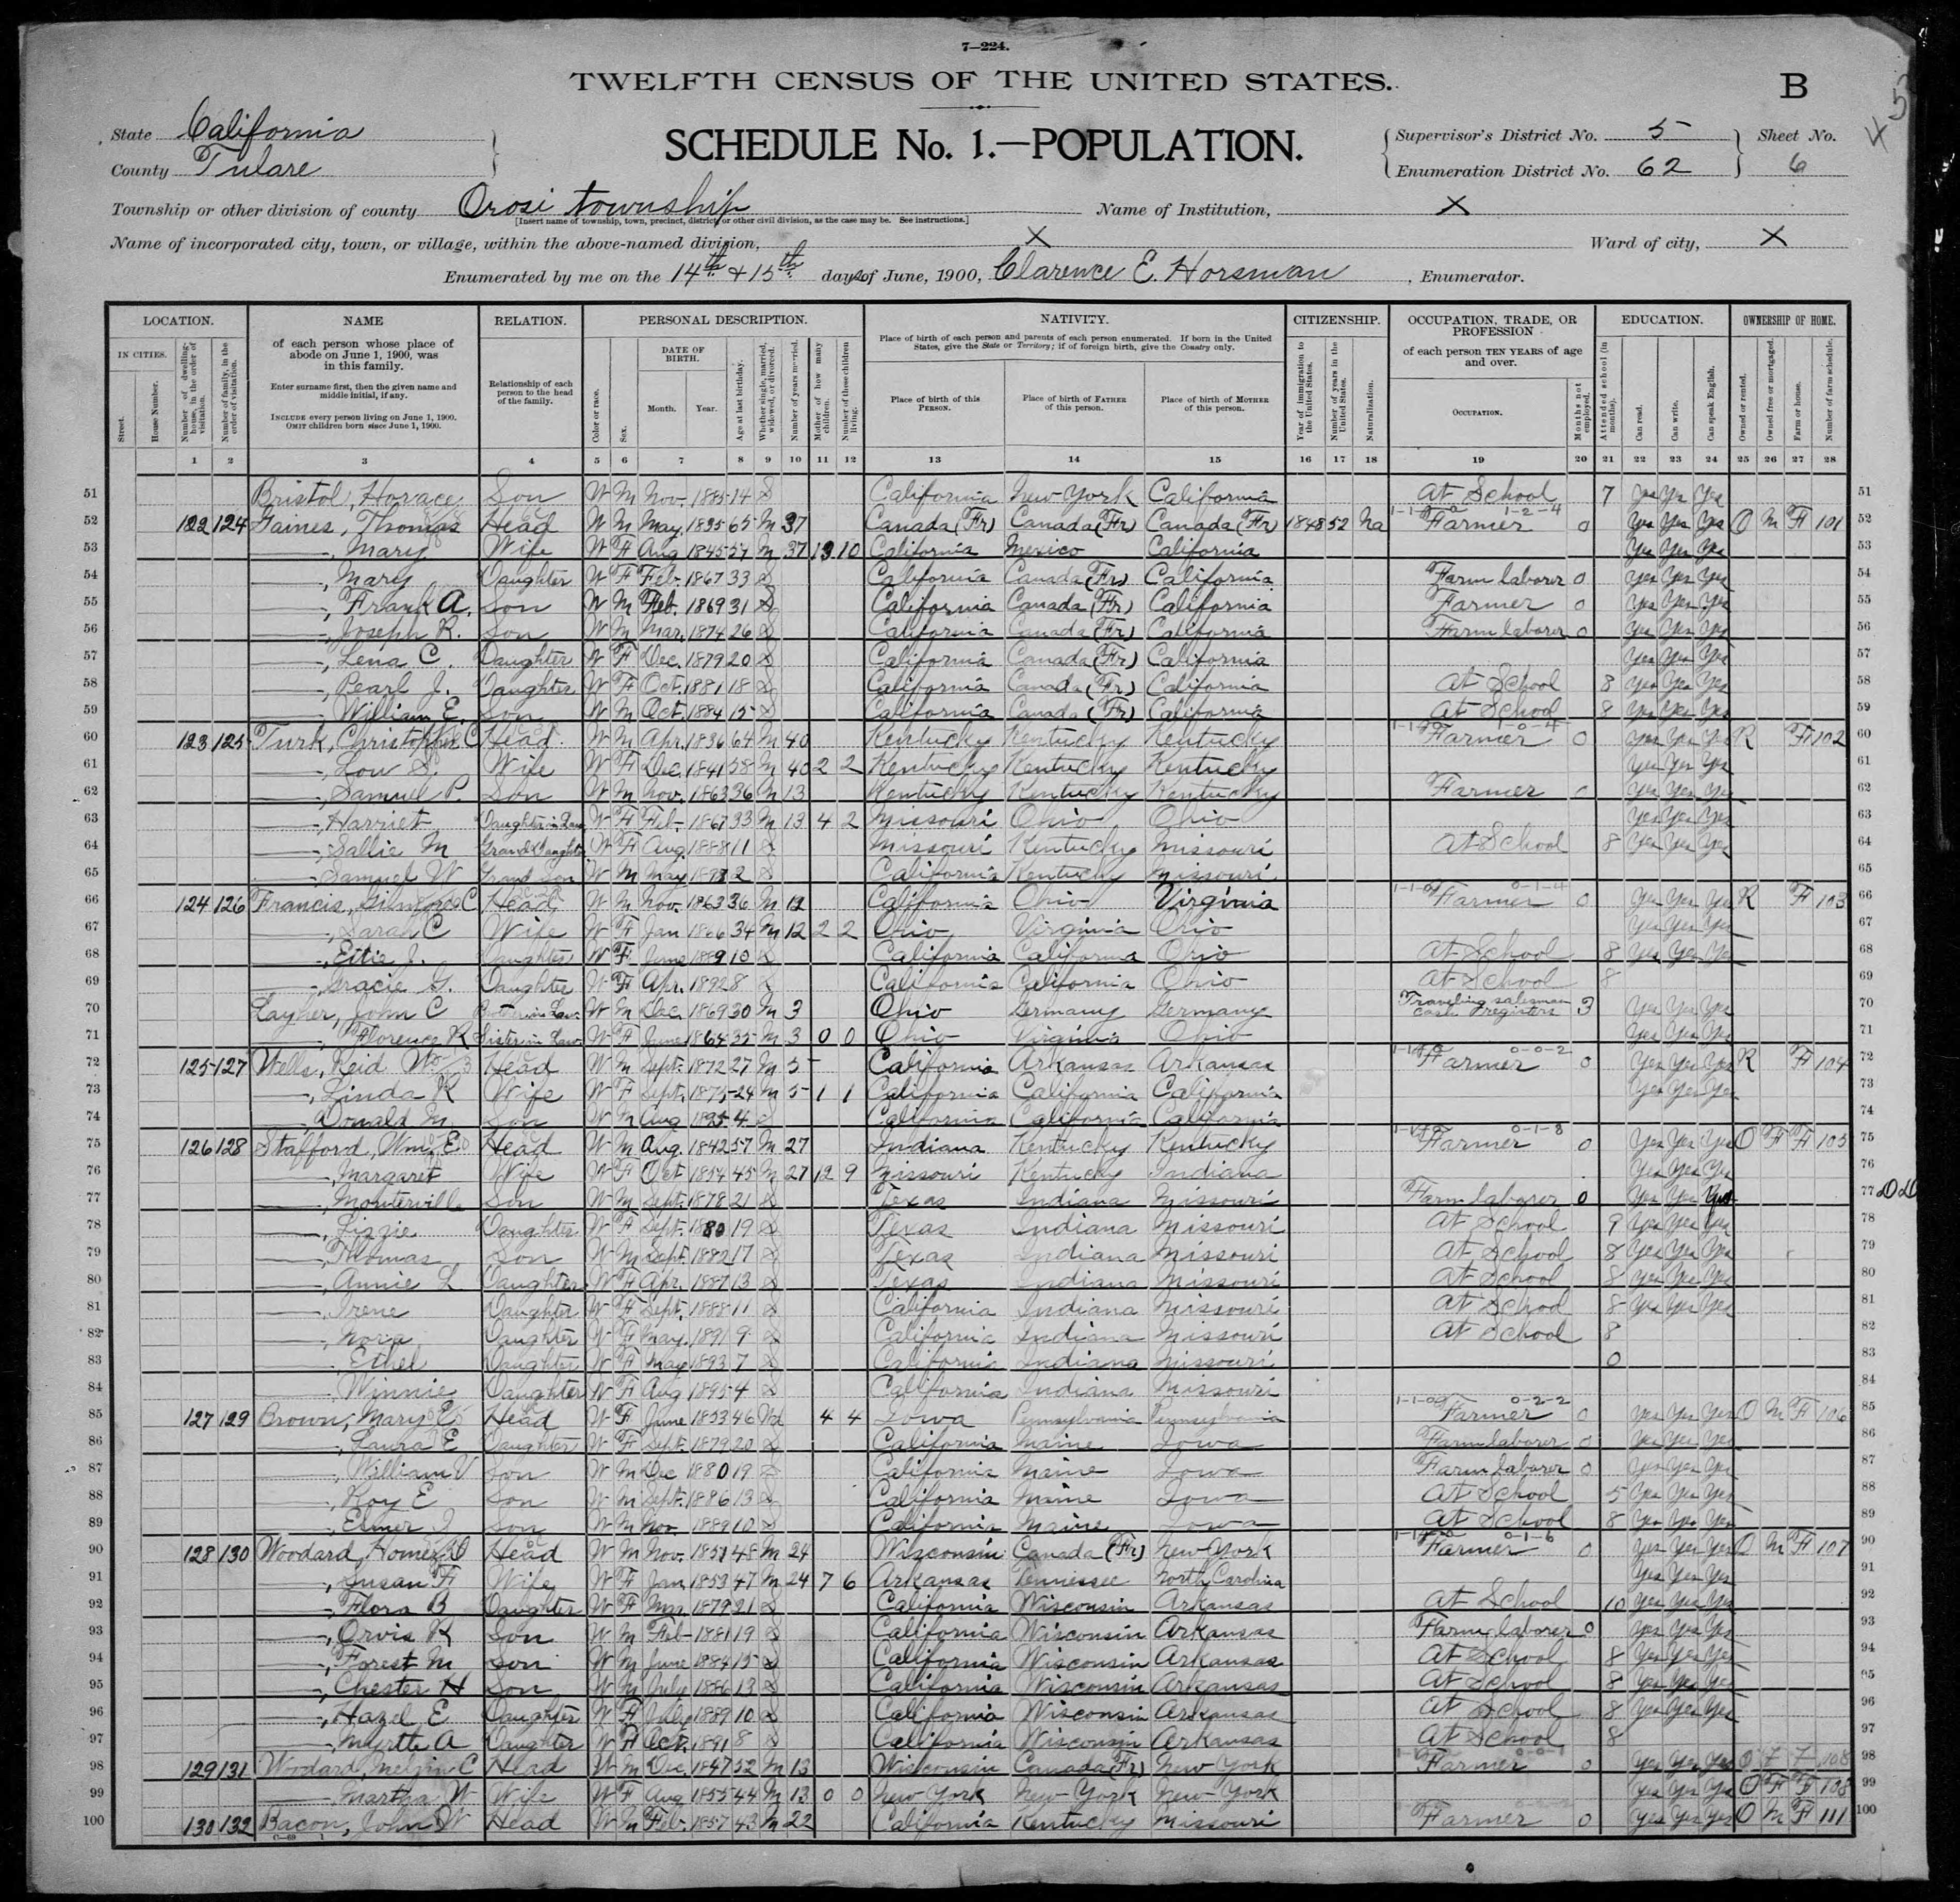 52 Ancestors Carrie Batson Mail Order Bride Putnam Sisters